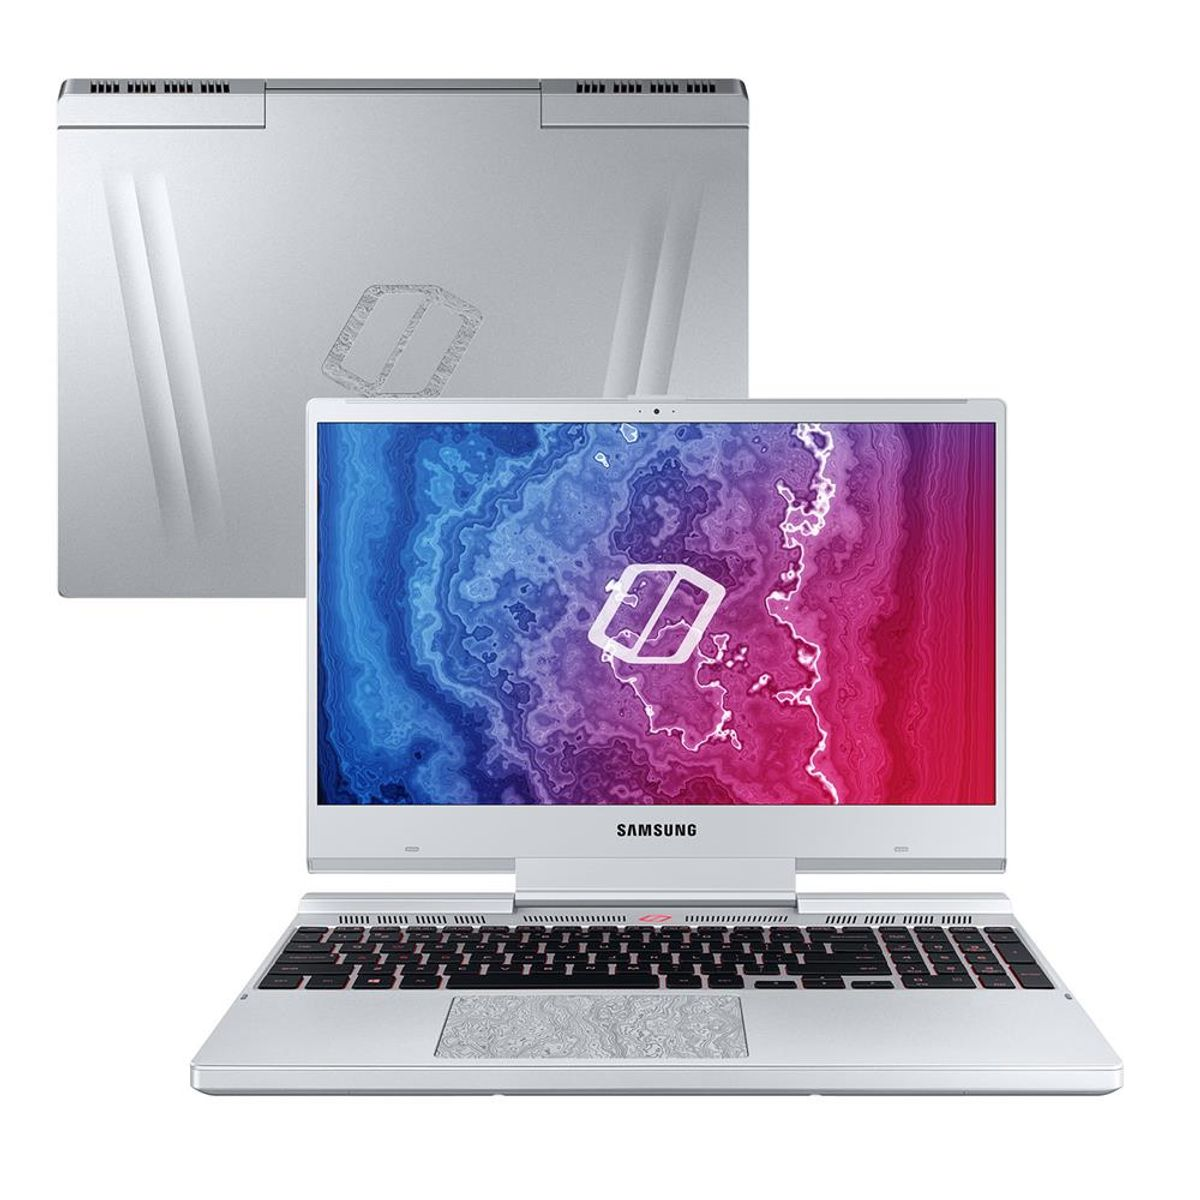 Notebookgamer - Samsung Np850xbd-xg1br I5-9300h 2.40ghz 8gb 1tb Padrão Geforce Gtx 1650 Windows 10 Home Odyssey 15,6